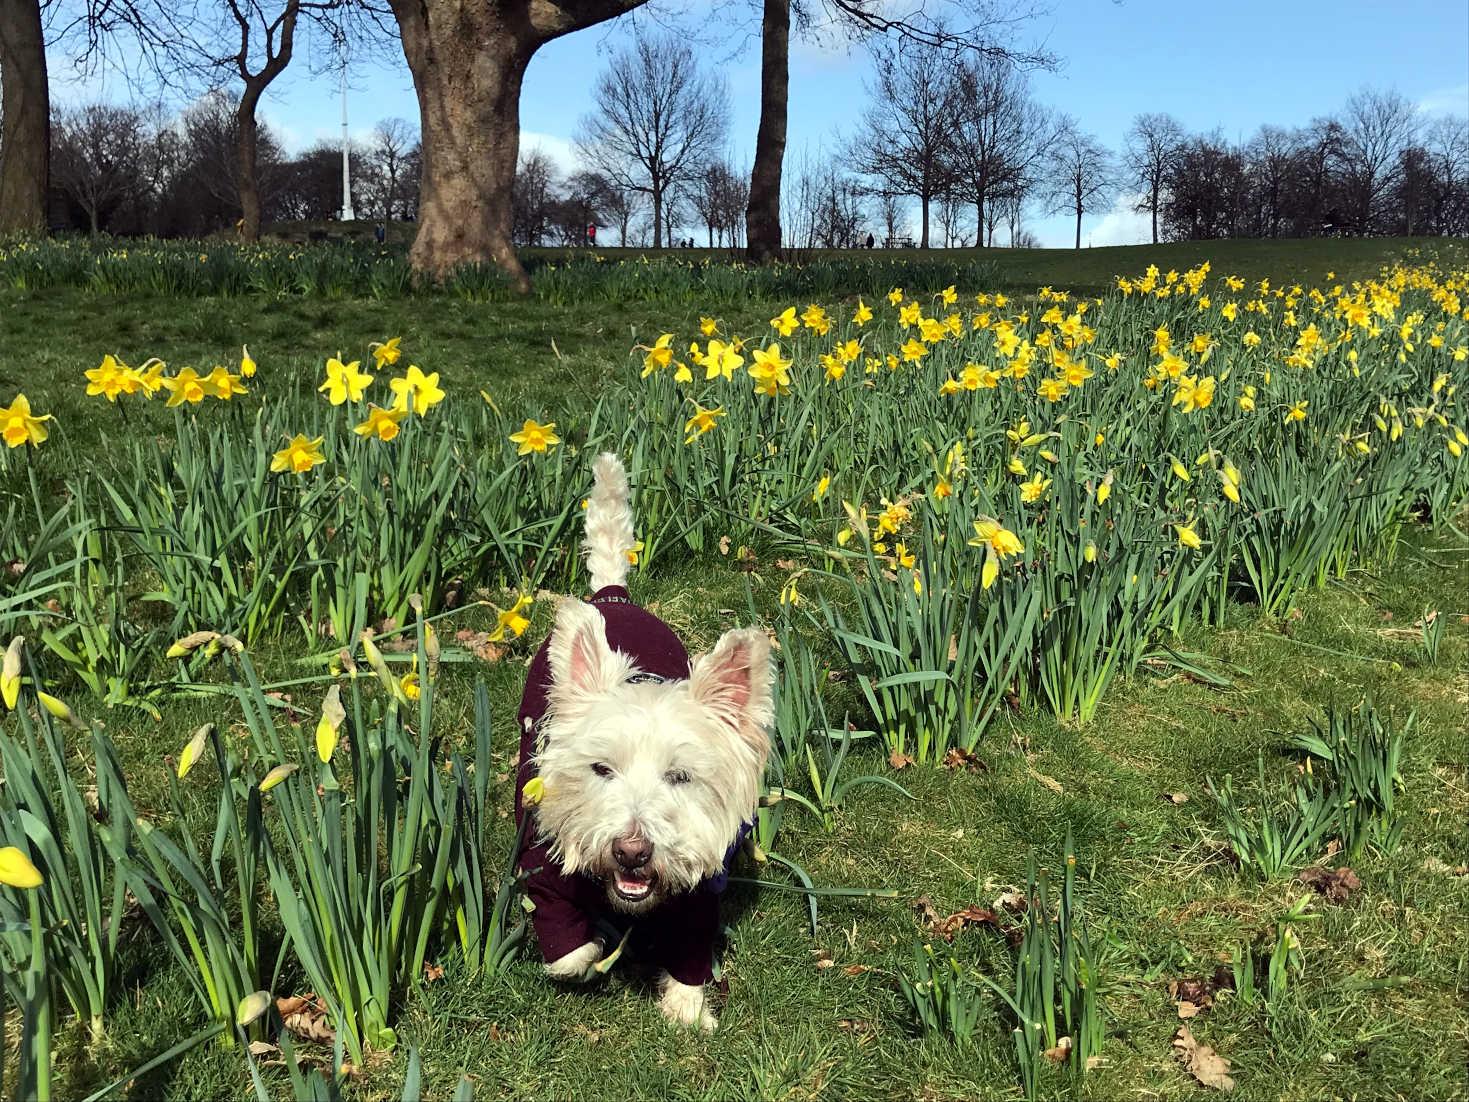 poppy the westie is loving spring